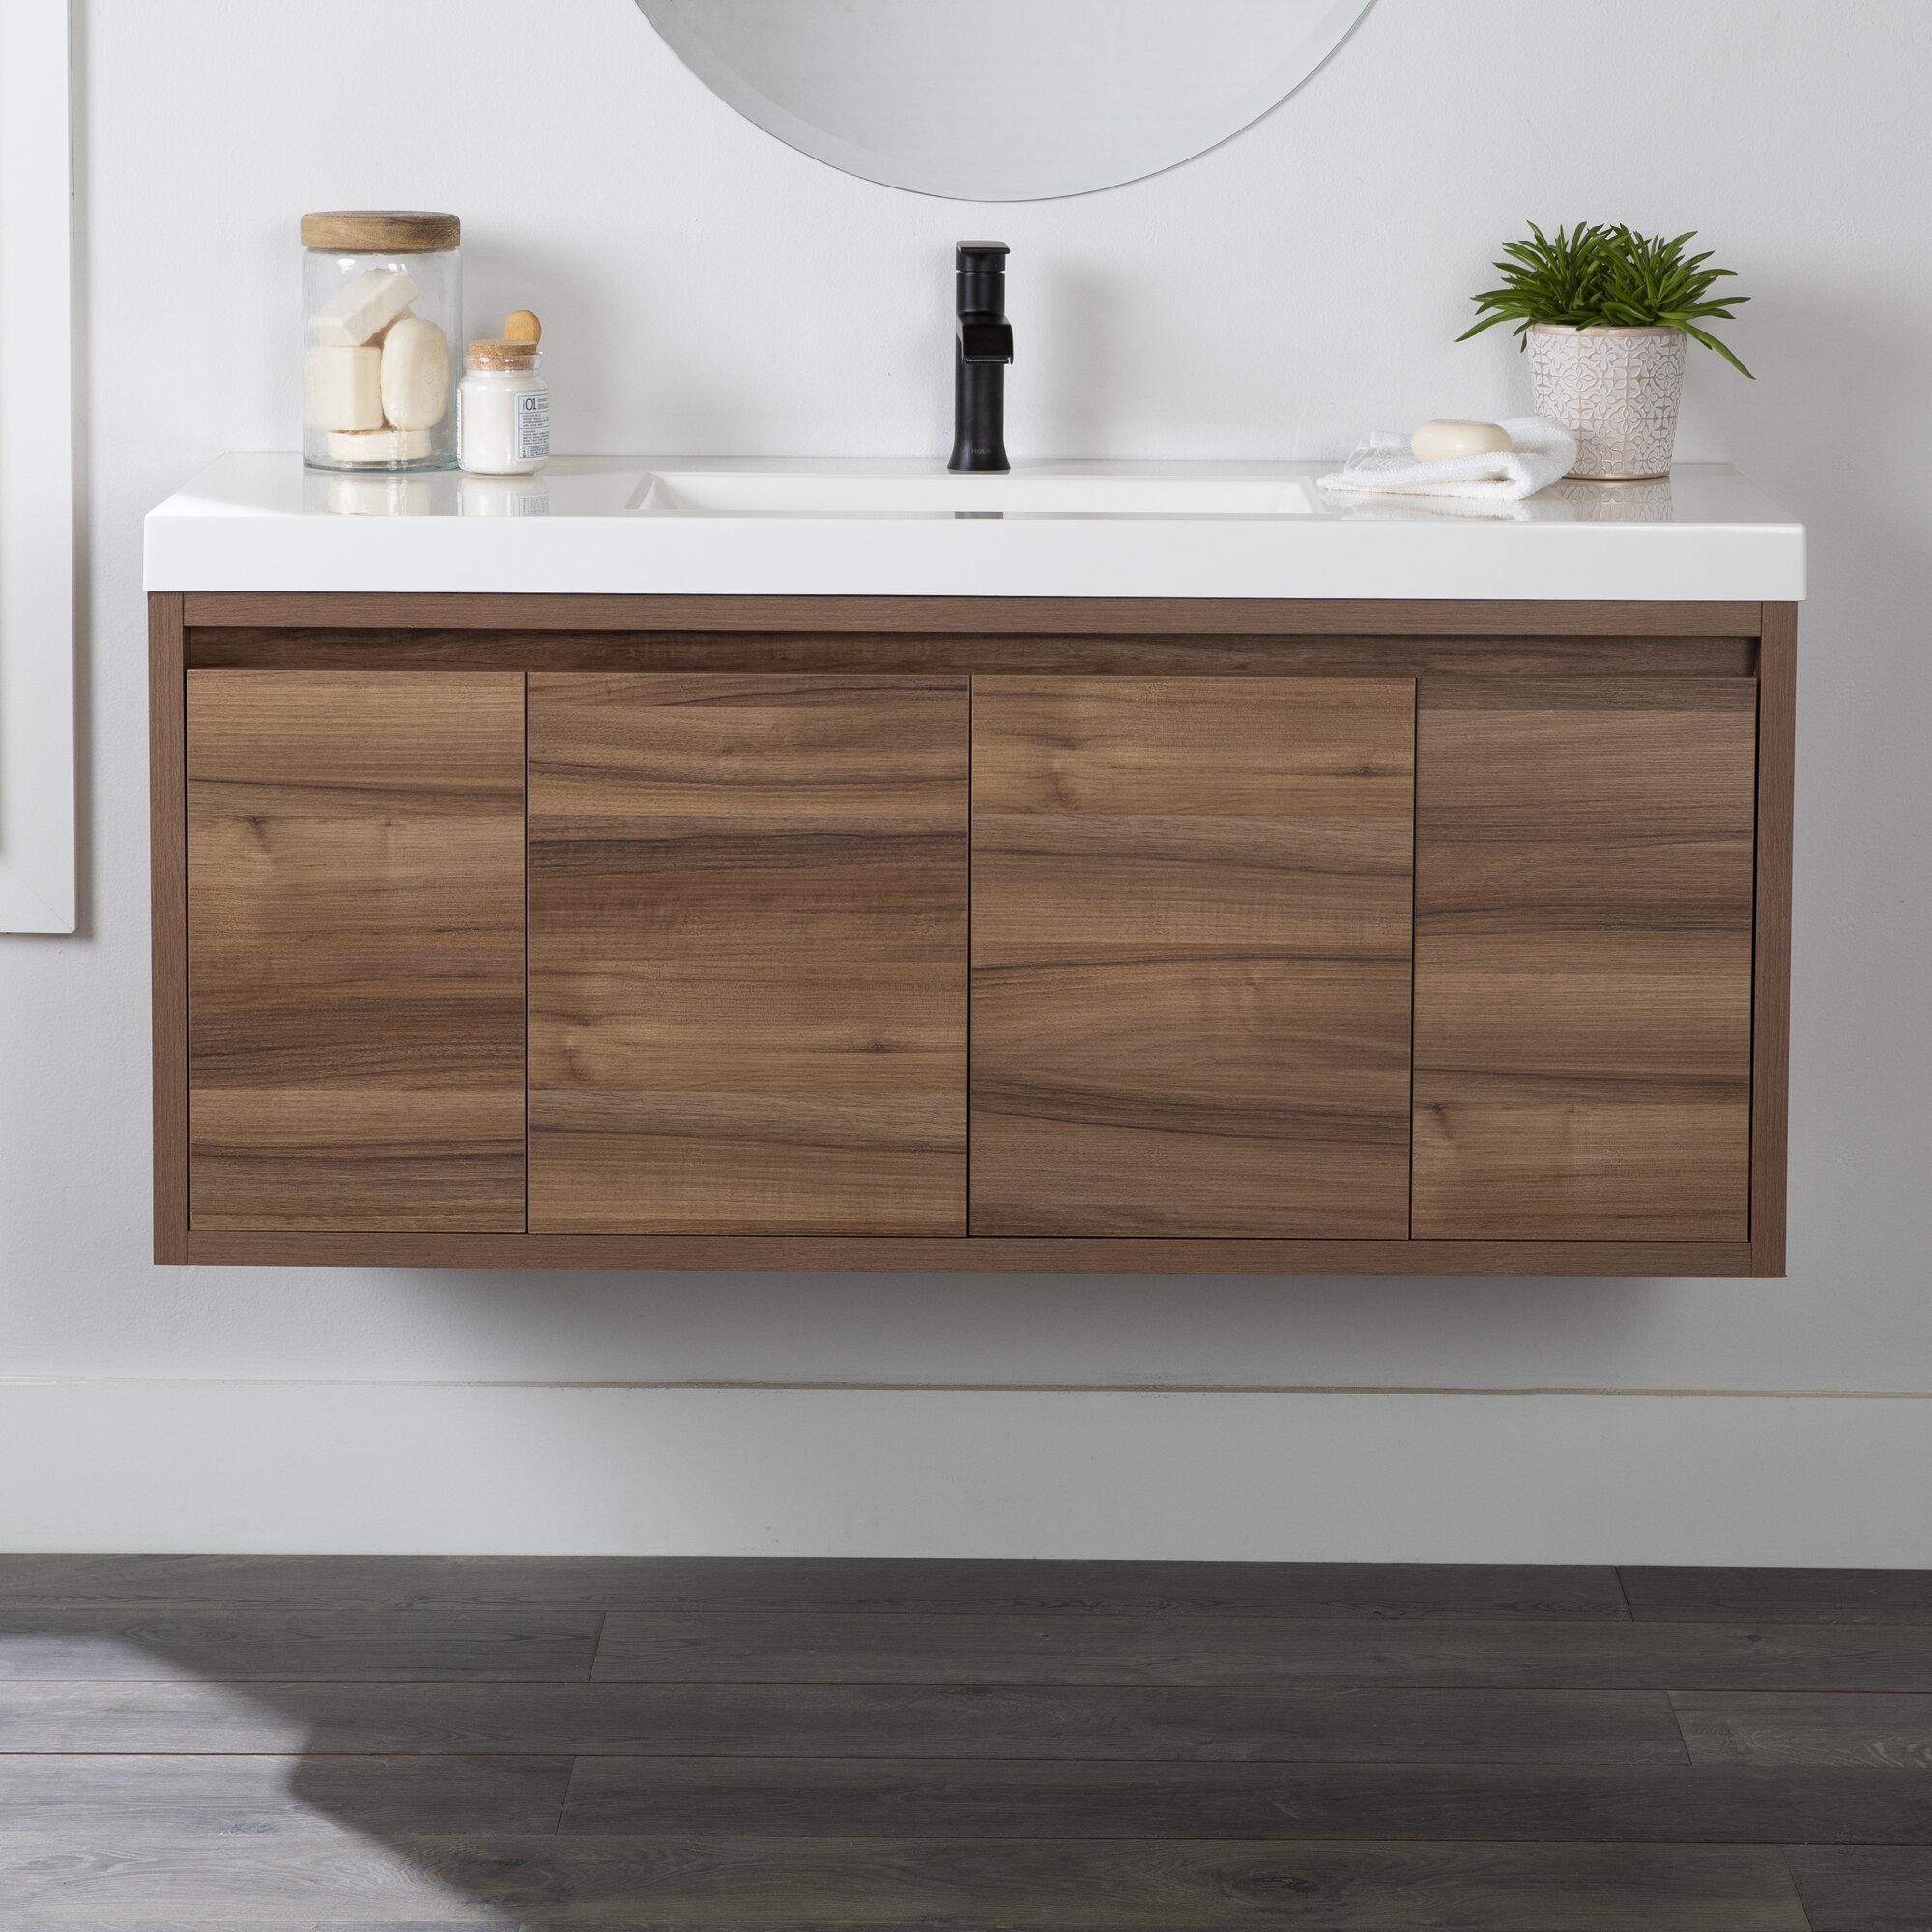 Mercury Row Altenburg 49 Wall Mounted Single Bathroom Vanity Set Reviews Wayfair